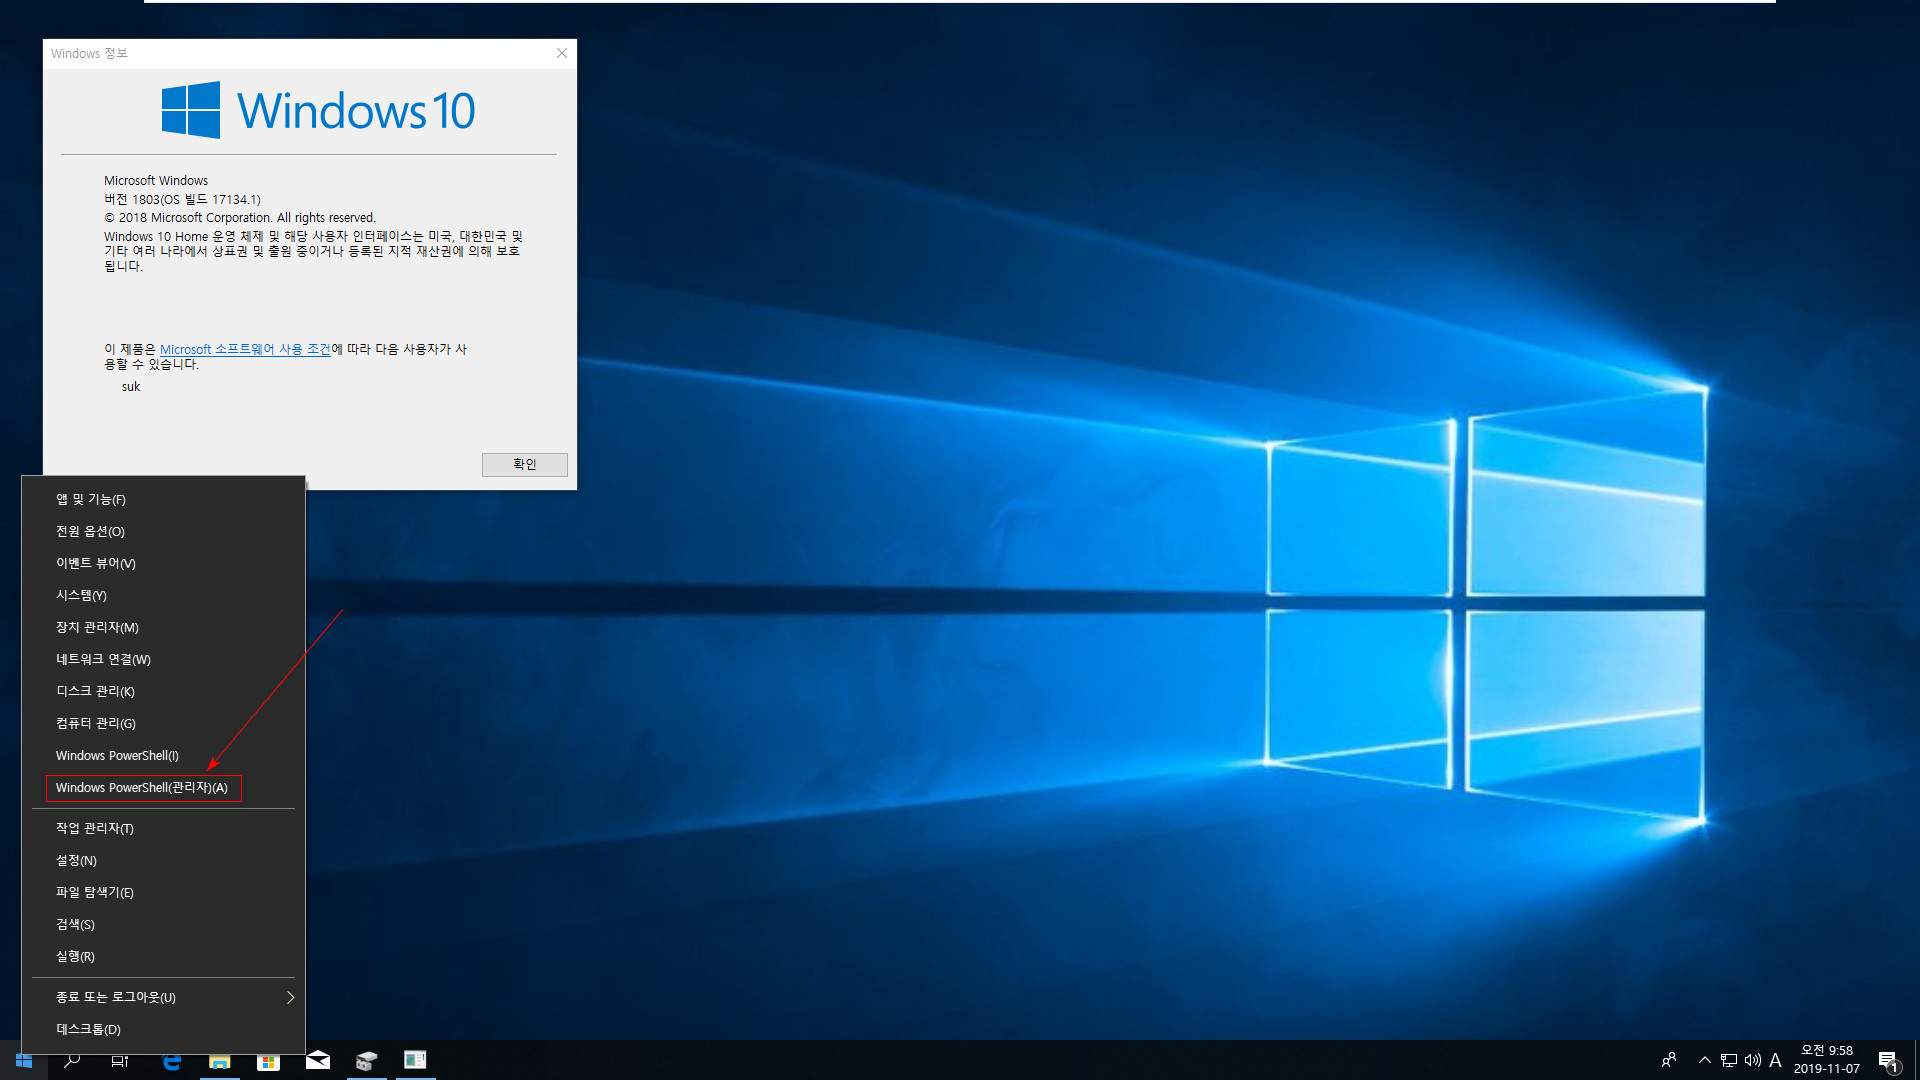 Windows 10 업데이트 방지하기 [업데이트 다운로드 폴더 사용 금지].bat 테스트 - 버전 1803, Home 에서 버전 1903 기능 업데이트 방지하기 - 적용 후에 컴퓨터 관리 불가 상태 해결 방법 2019-11-07_095830.jpg